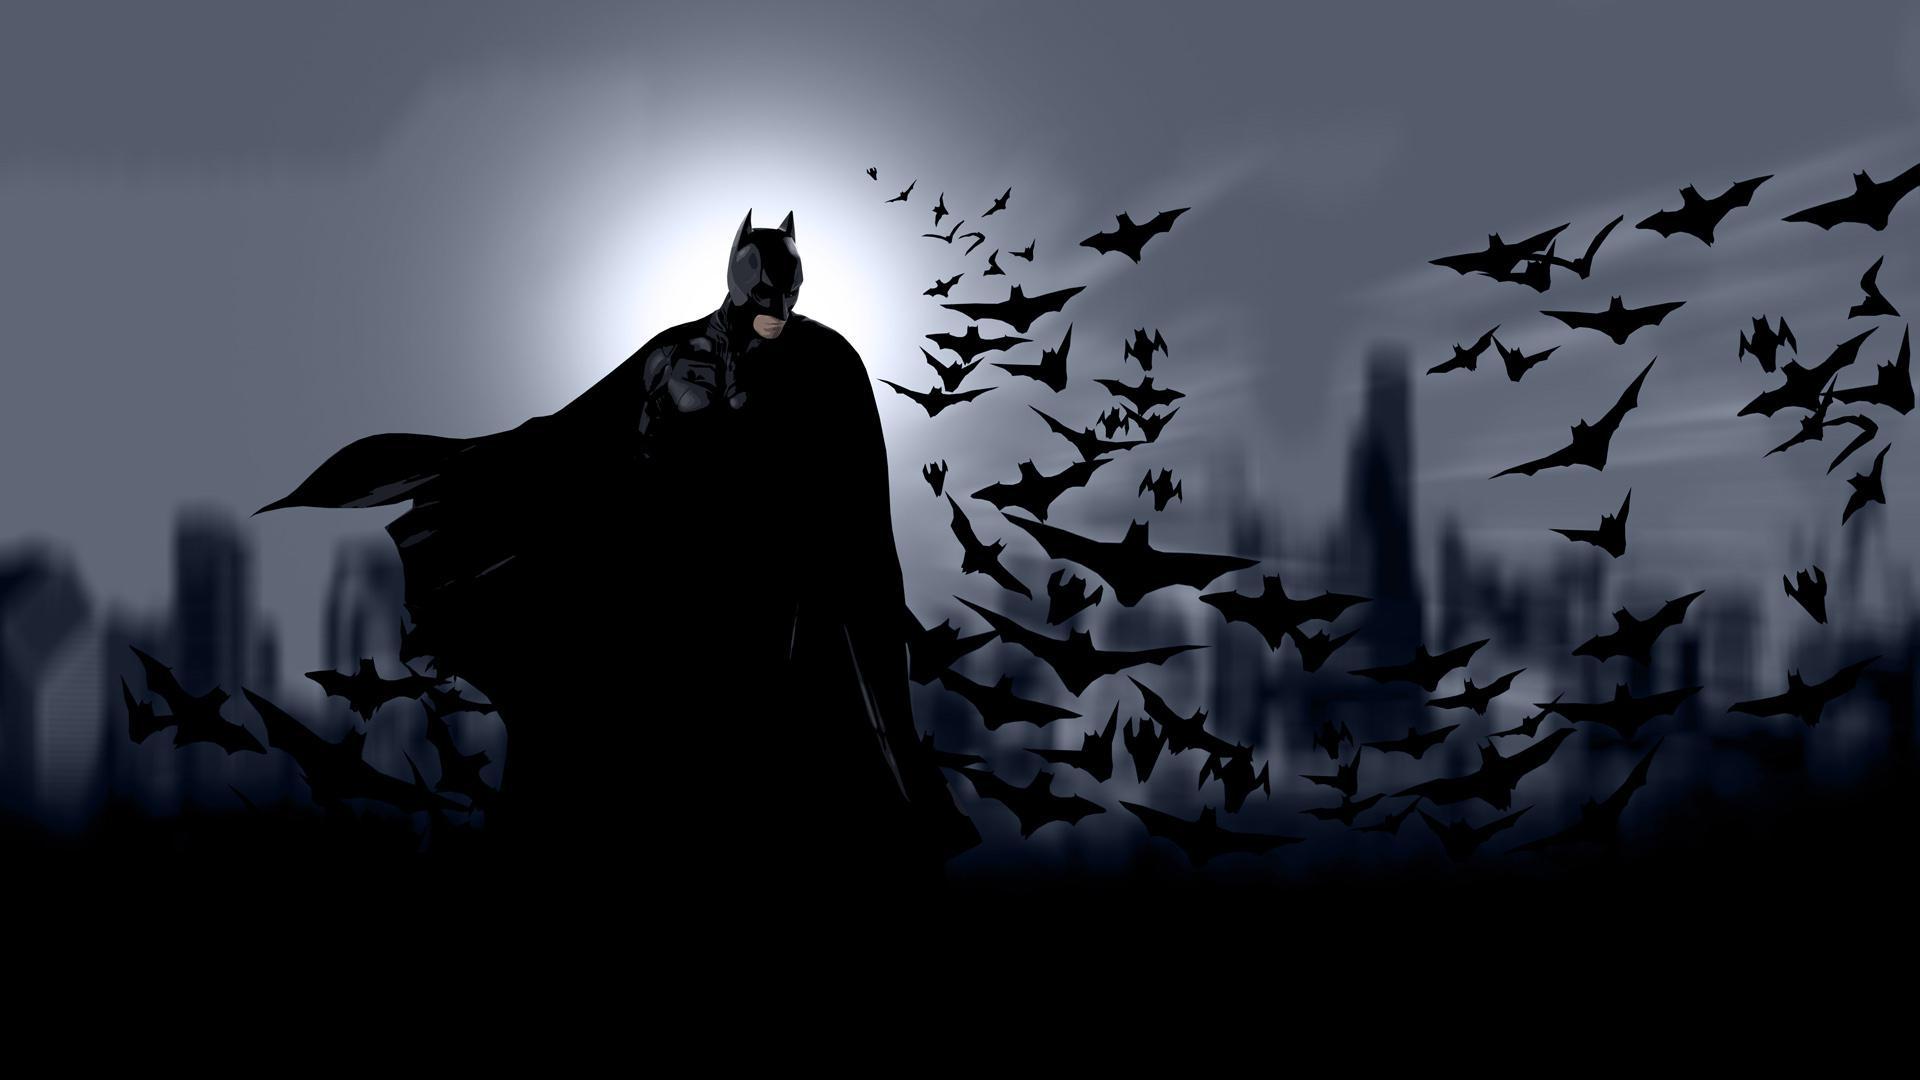 Бэтмен с мышами, Batman, кино обои на телефон, 1920 на 1080 пикселей